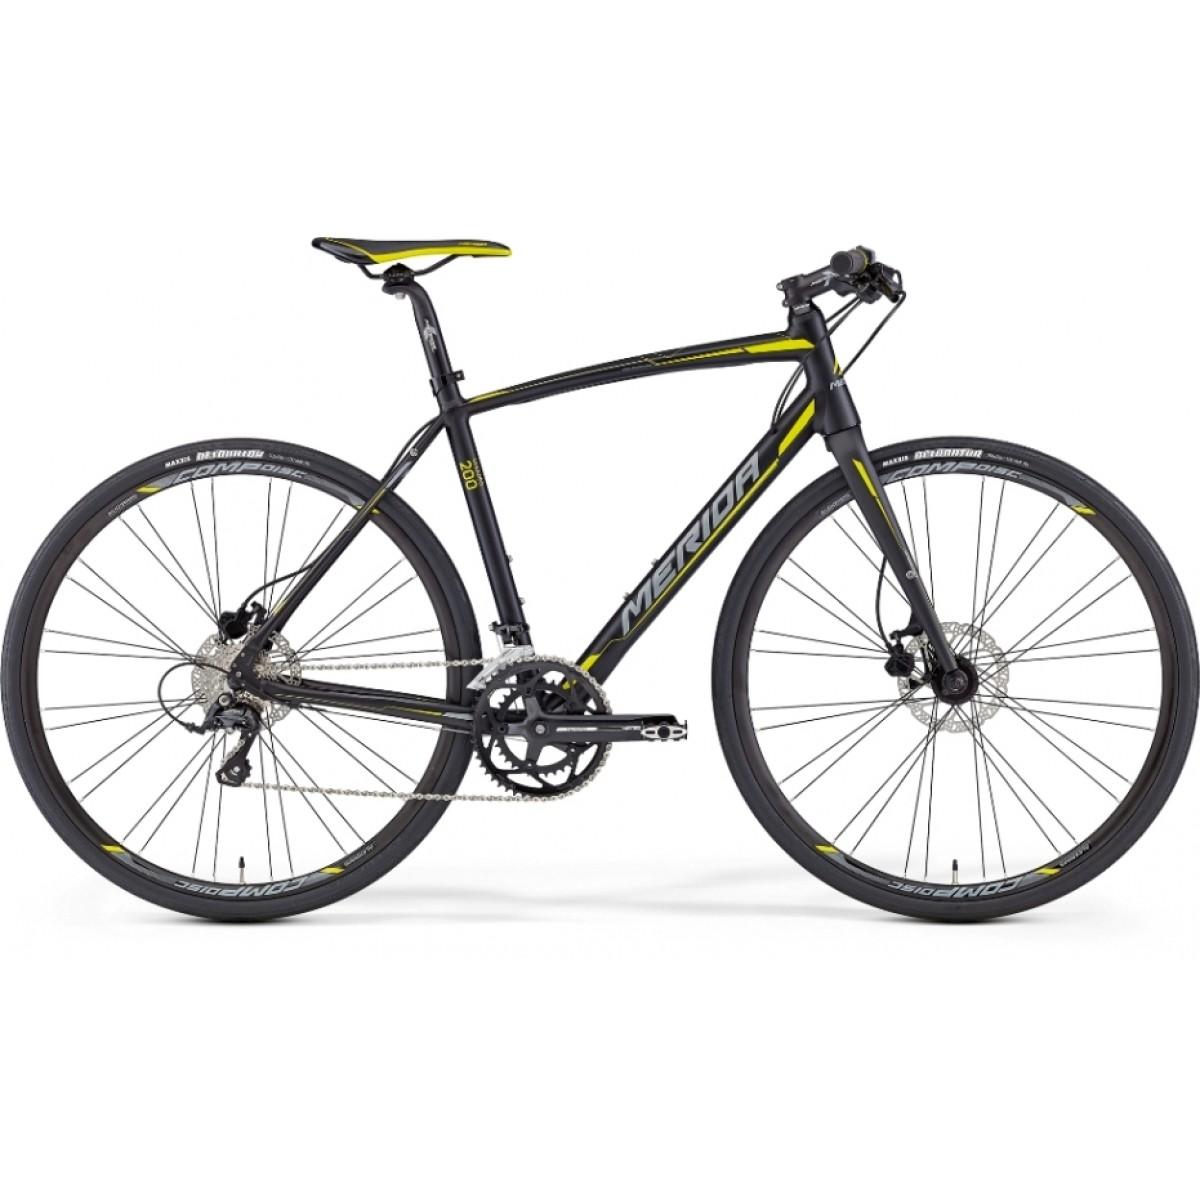 Merida Speeder 200 Flar Bar Road Bike